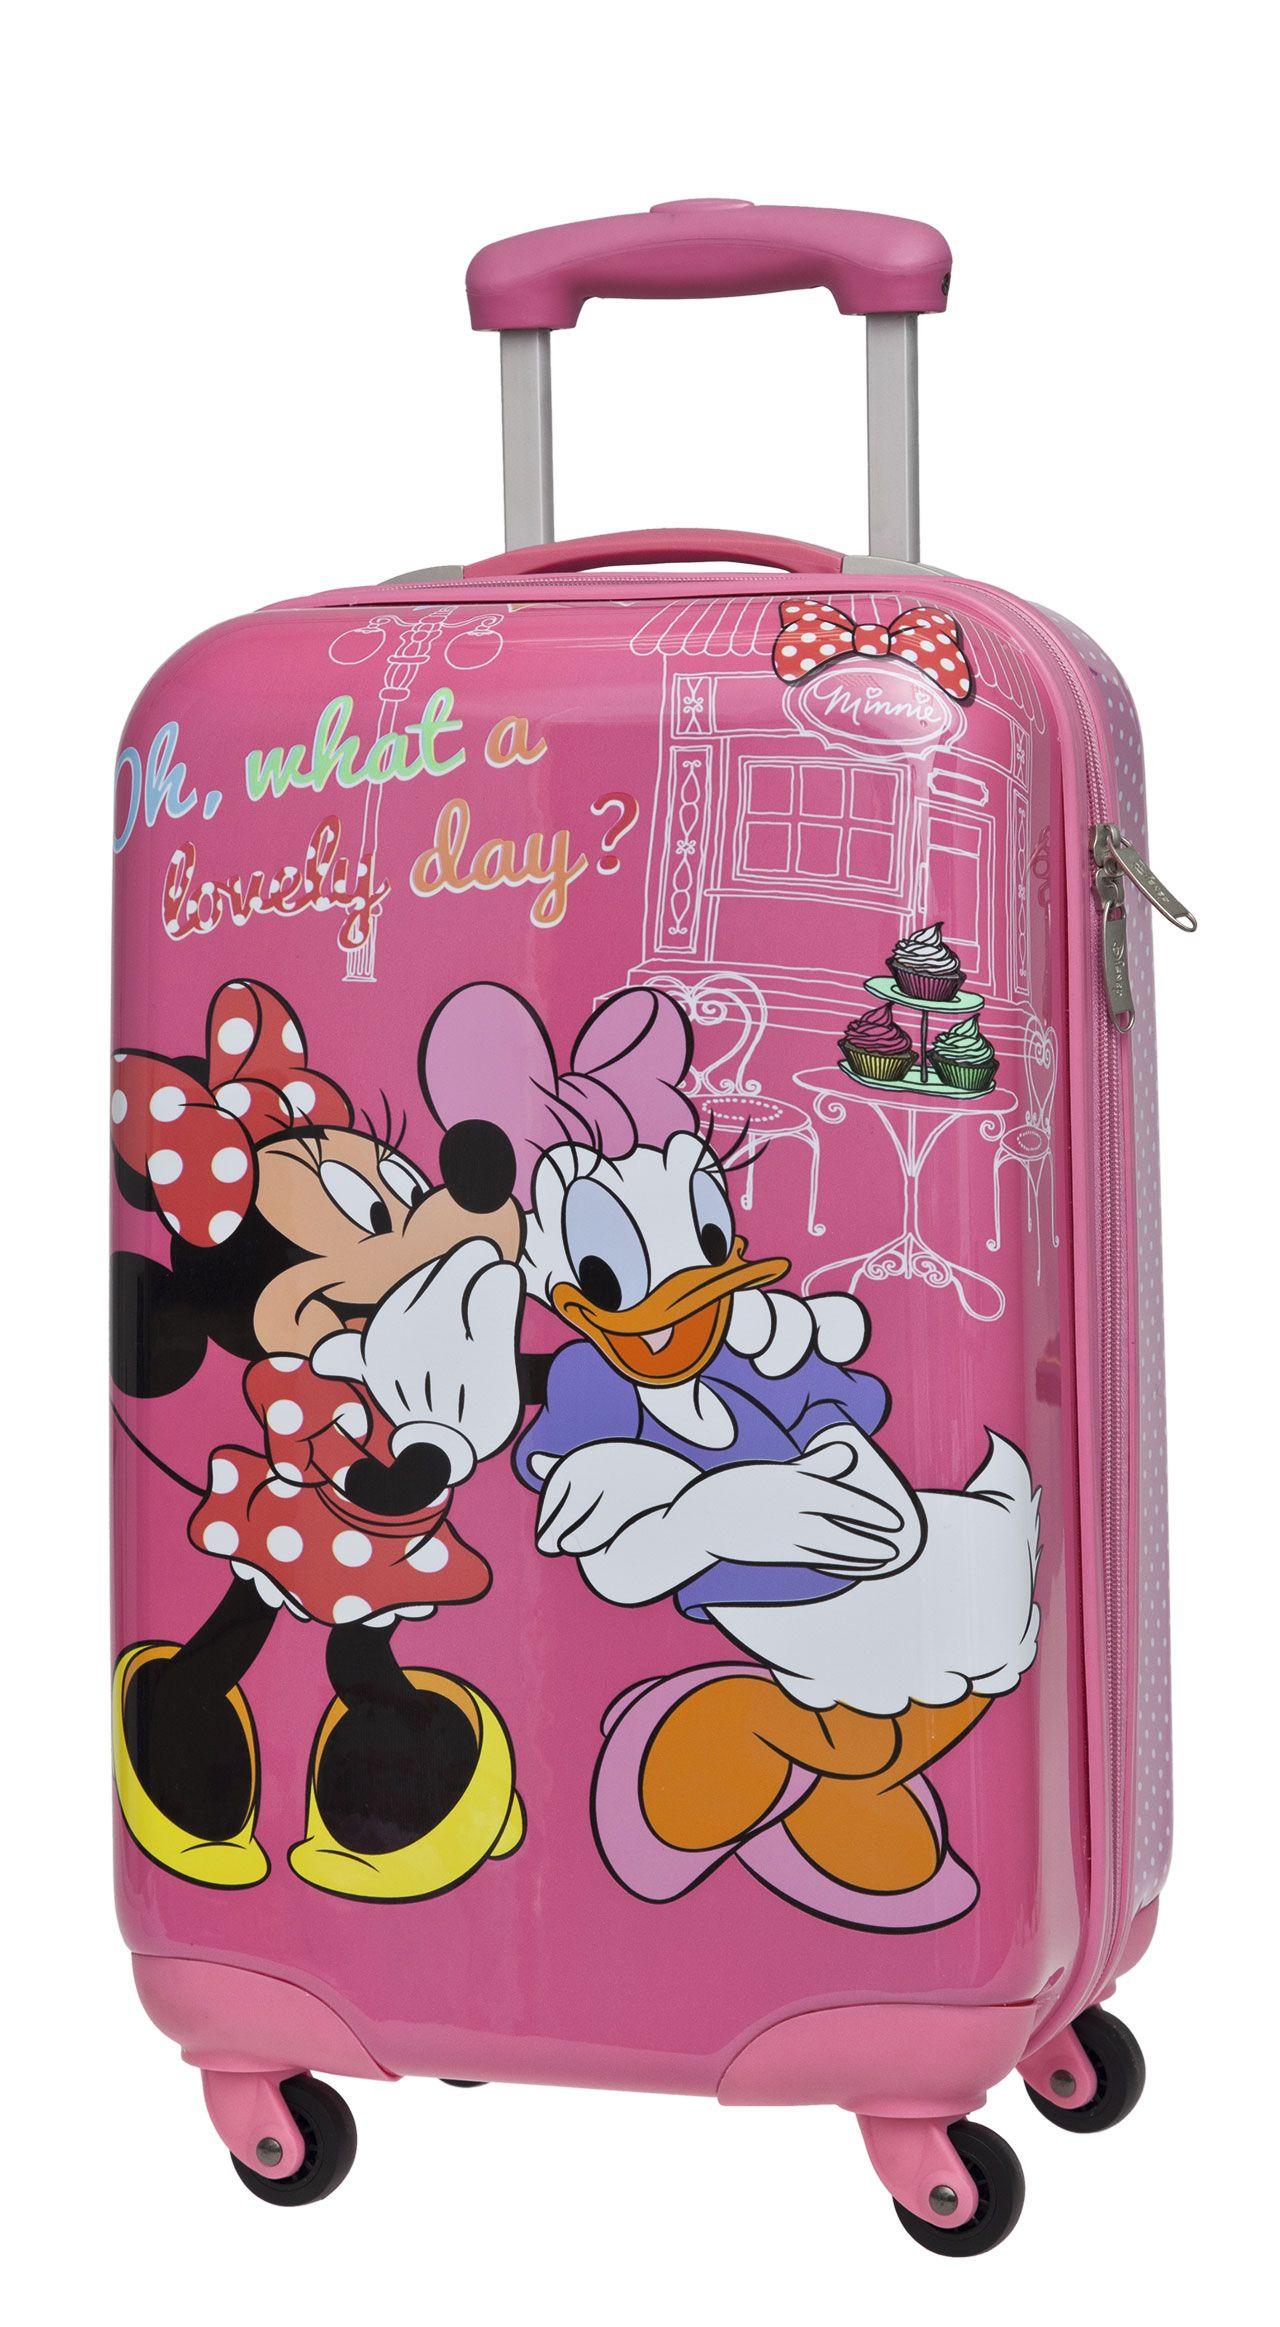 74e176f3818fa Minnie Y Daisy, Minnie Mouse, Bolso Disney, Daisy Duck, Carry On Luggage